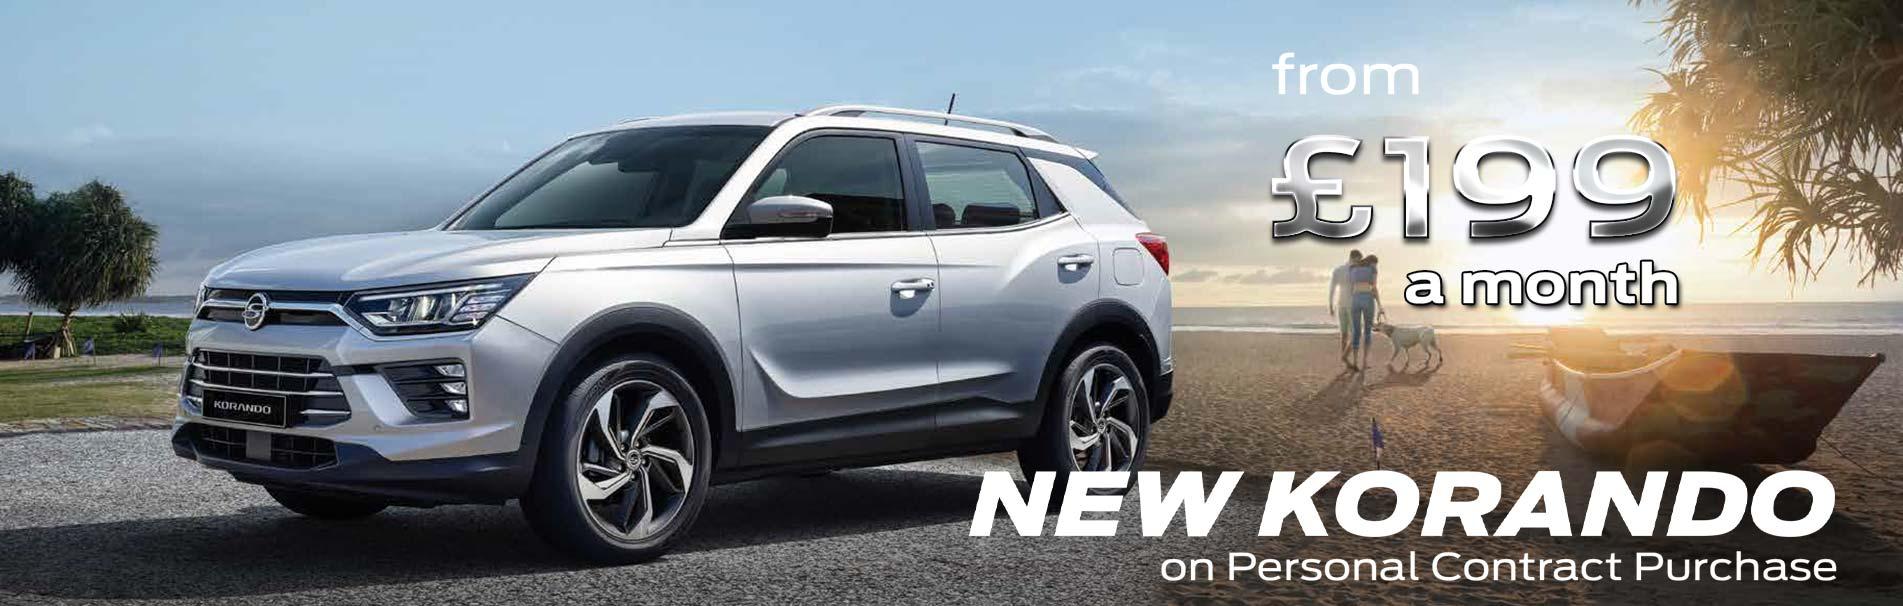 new-ssangyong-korando-pcp-price-199-a-month-sli-0006